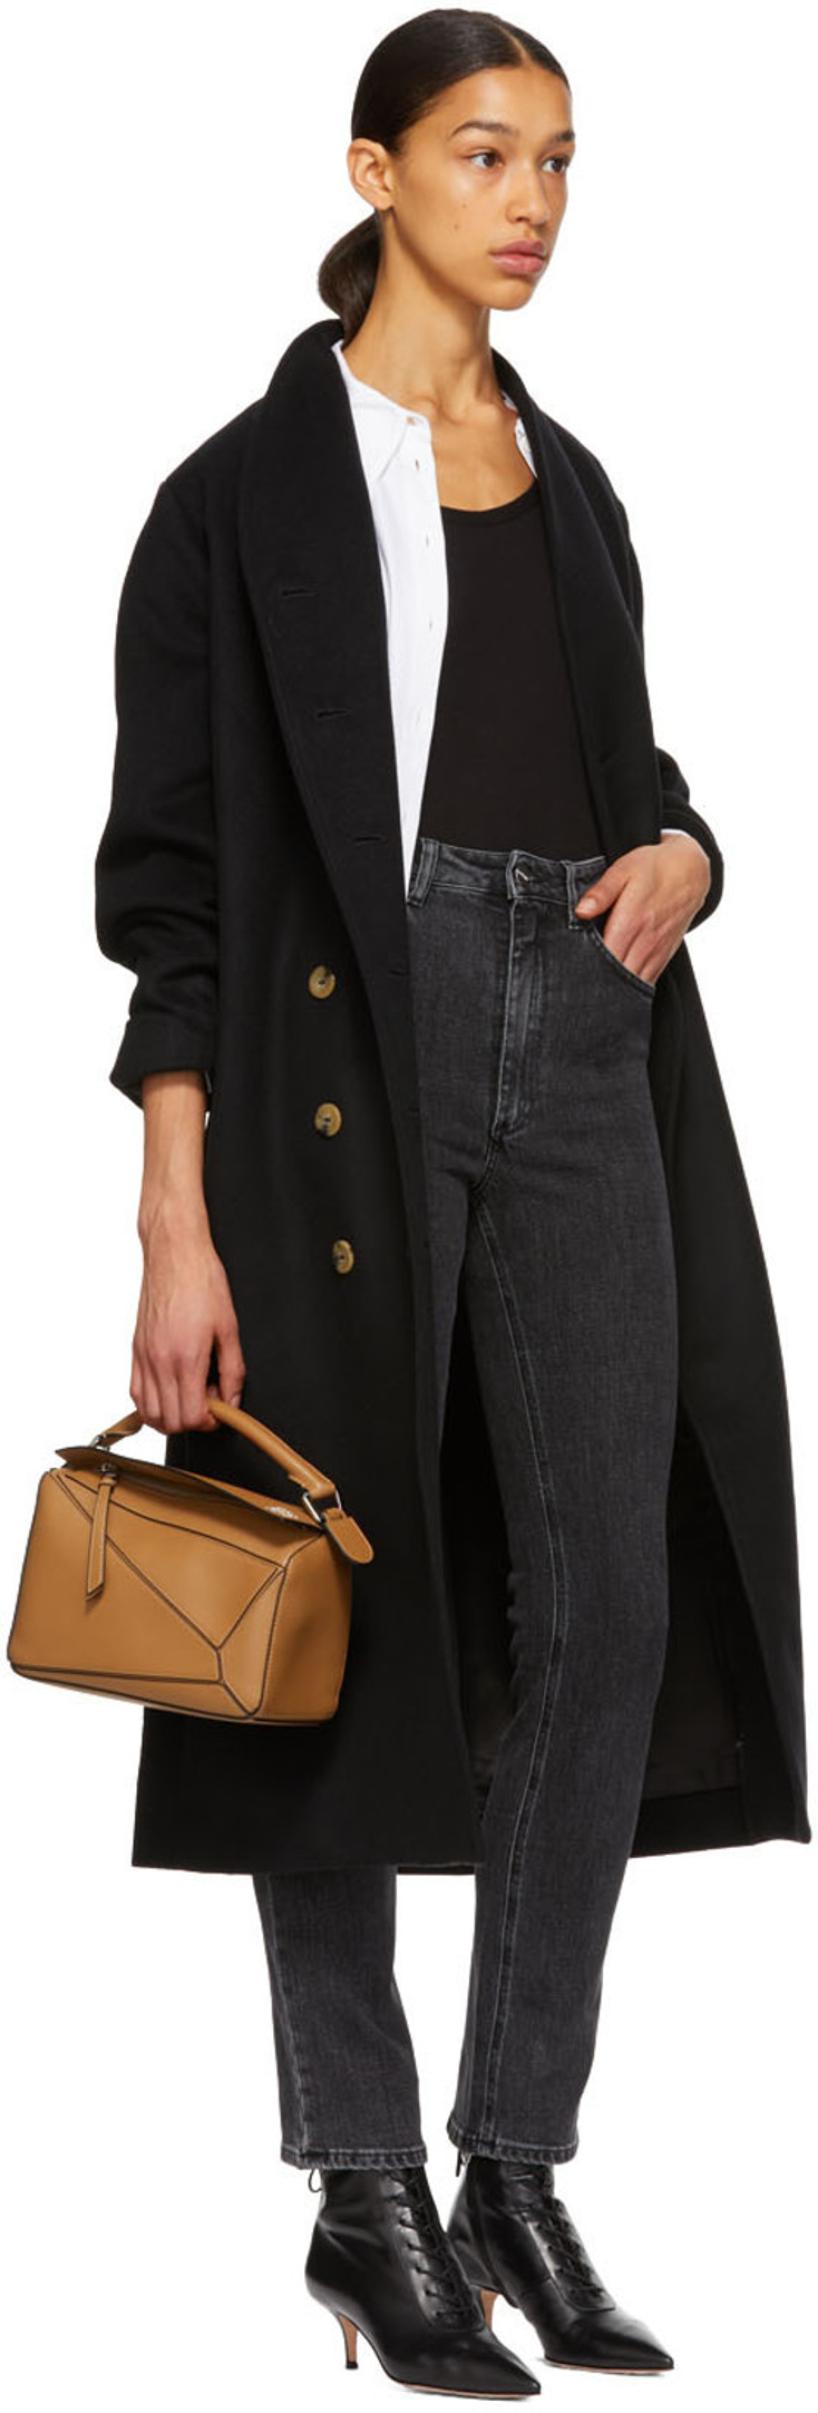 bda17b079092 TotÊMe Black Wool Bergerac Coat In 200 Black   ModeSens